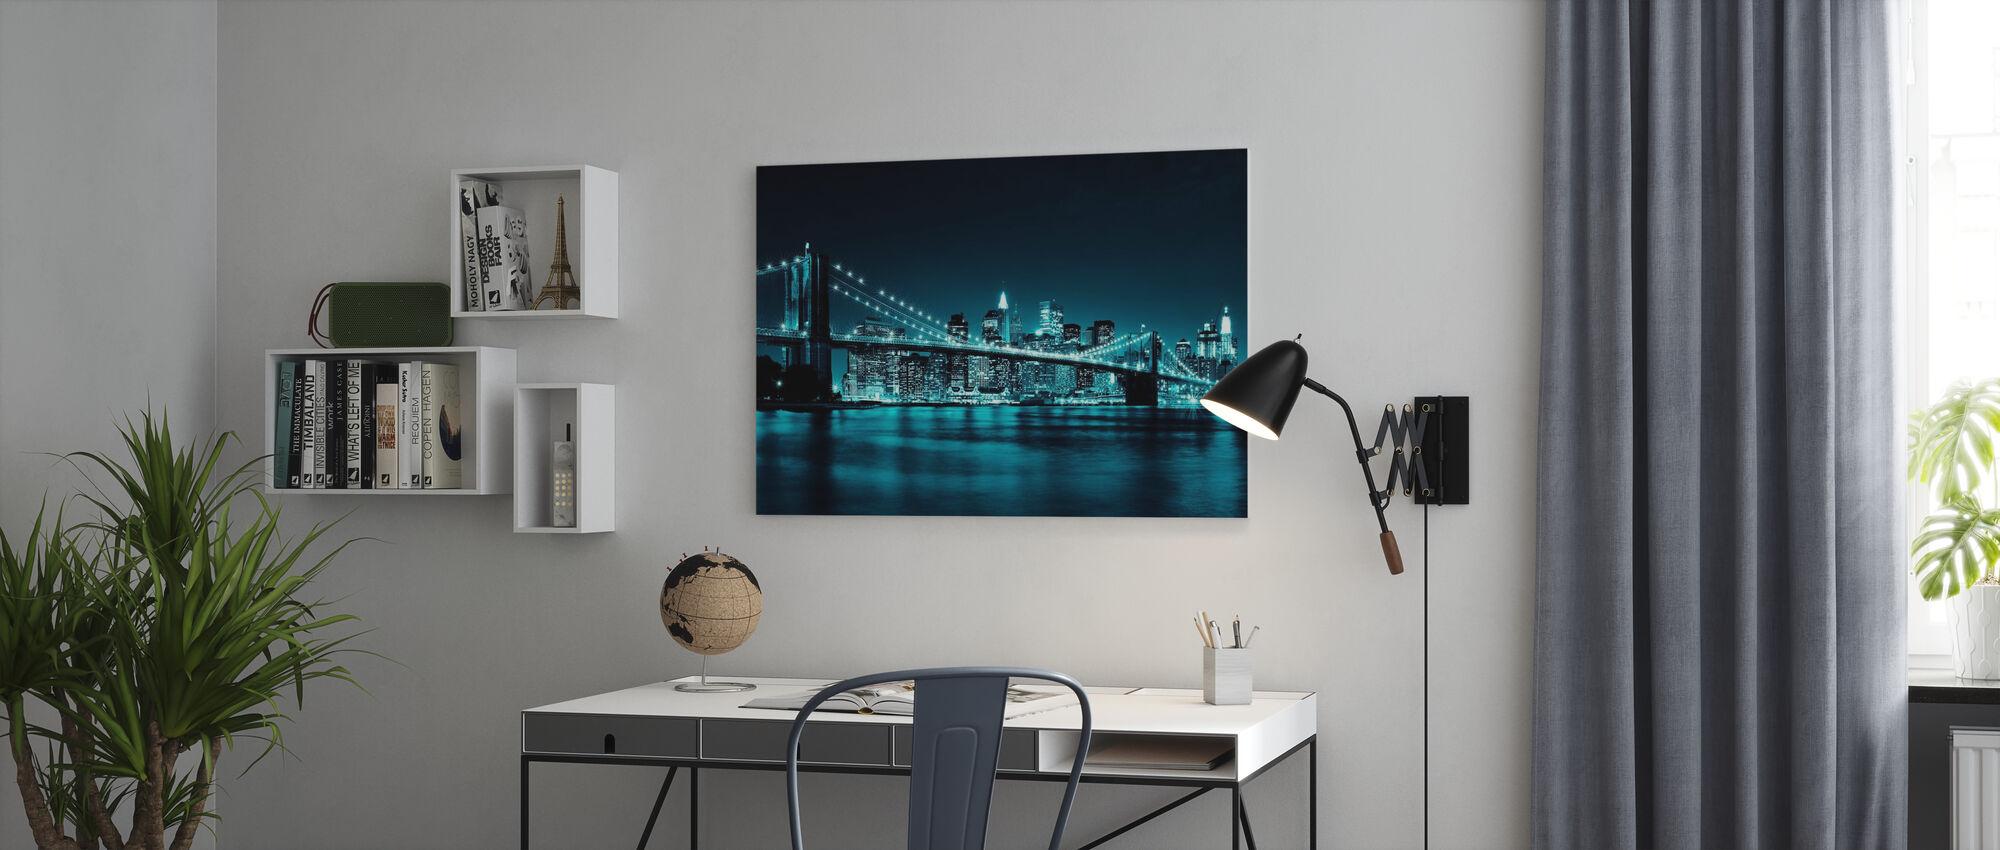 Brooklyn Bridge - Blauw - Canvas print - Kantoor